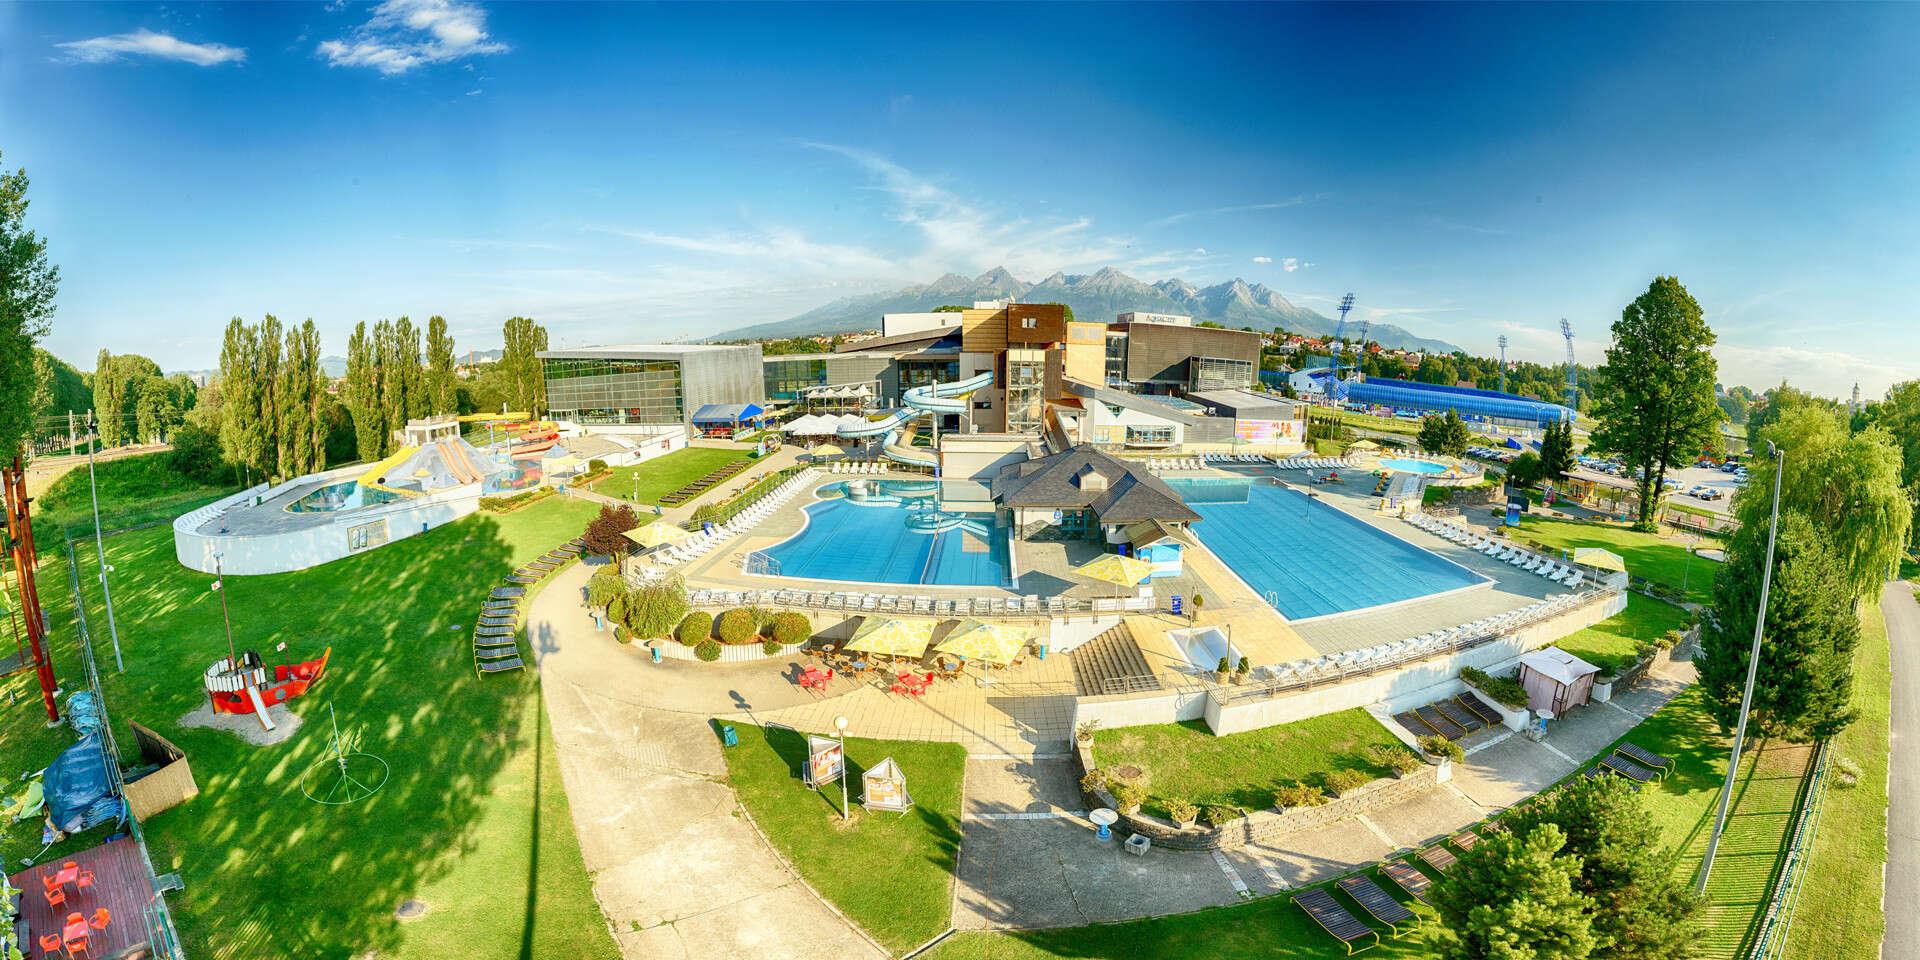 Relax v AquaCity Poprad alebo dobrodružstvo v Slovenskom raji s výh...